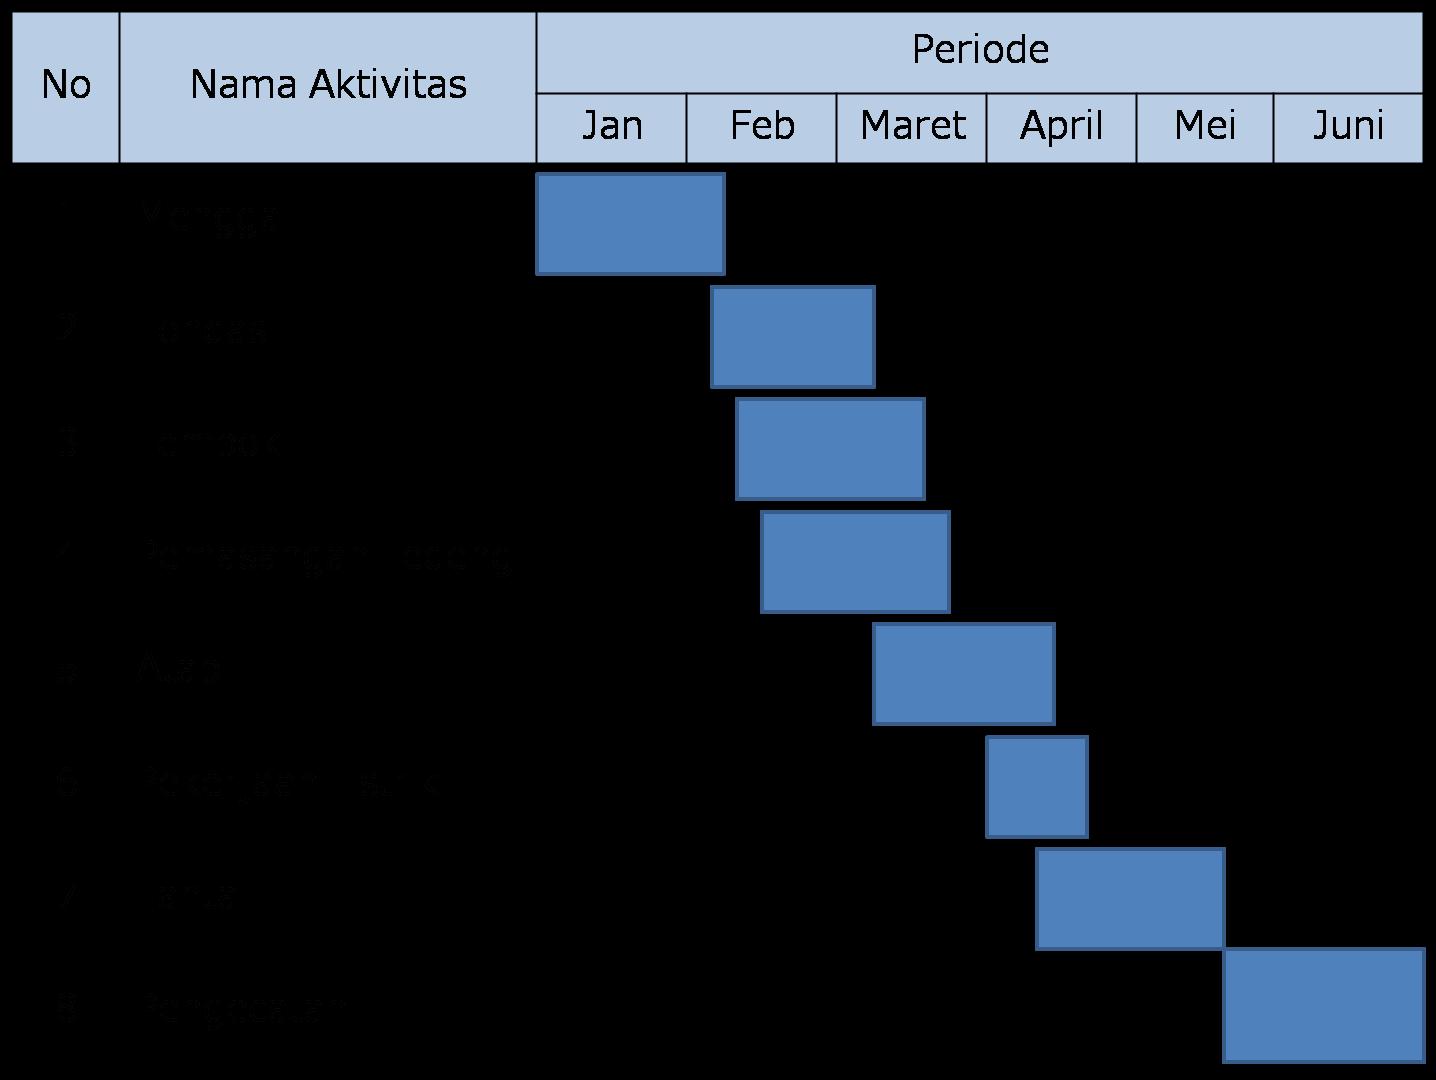 Contoh Soal Dan Materi Pelajaran 2 Contoh Gantt Chart Skripsi